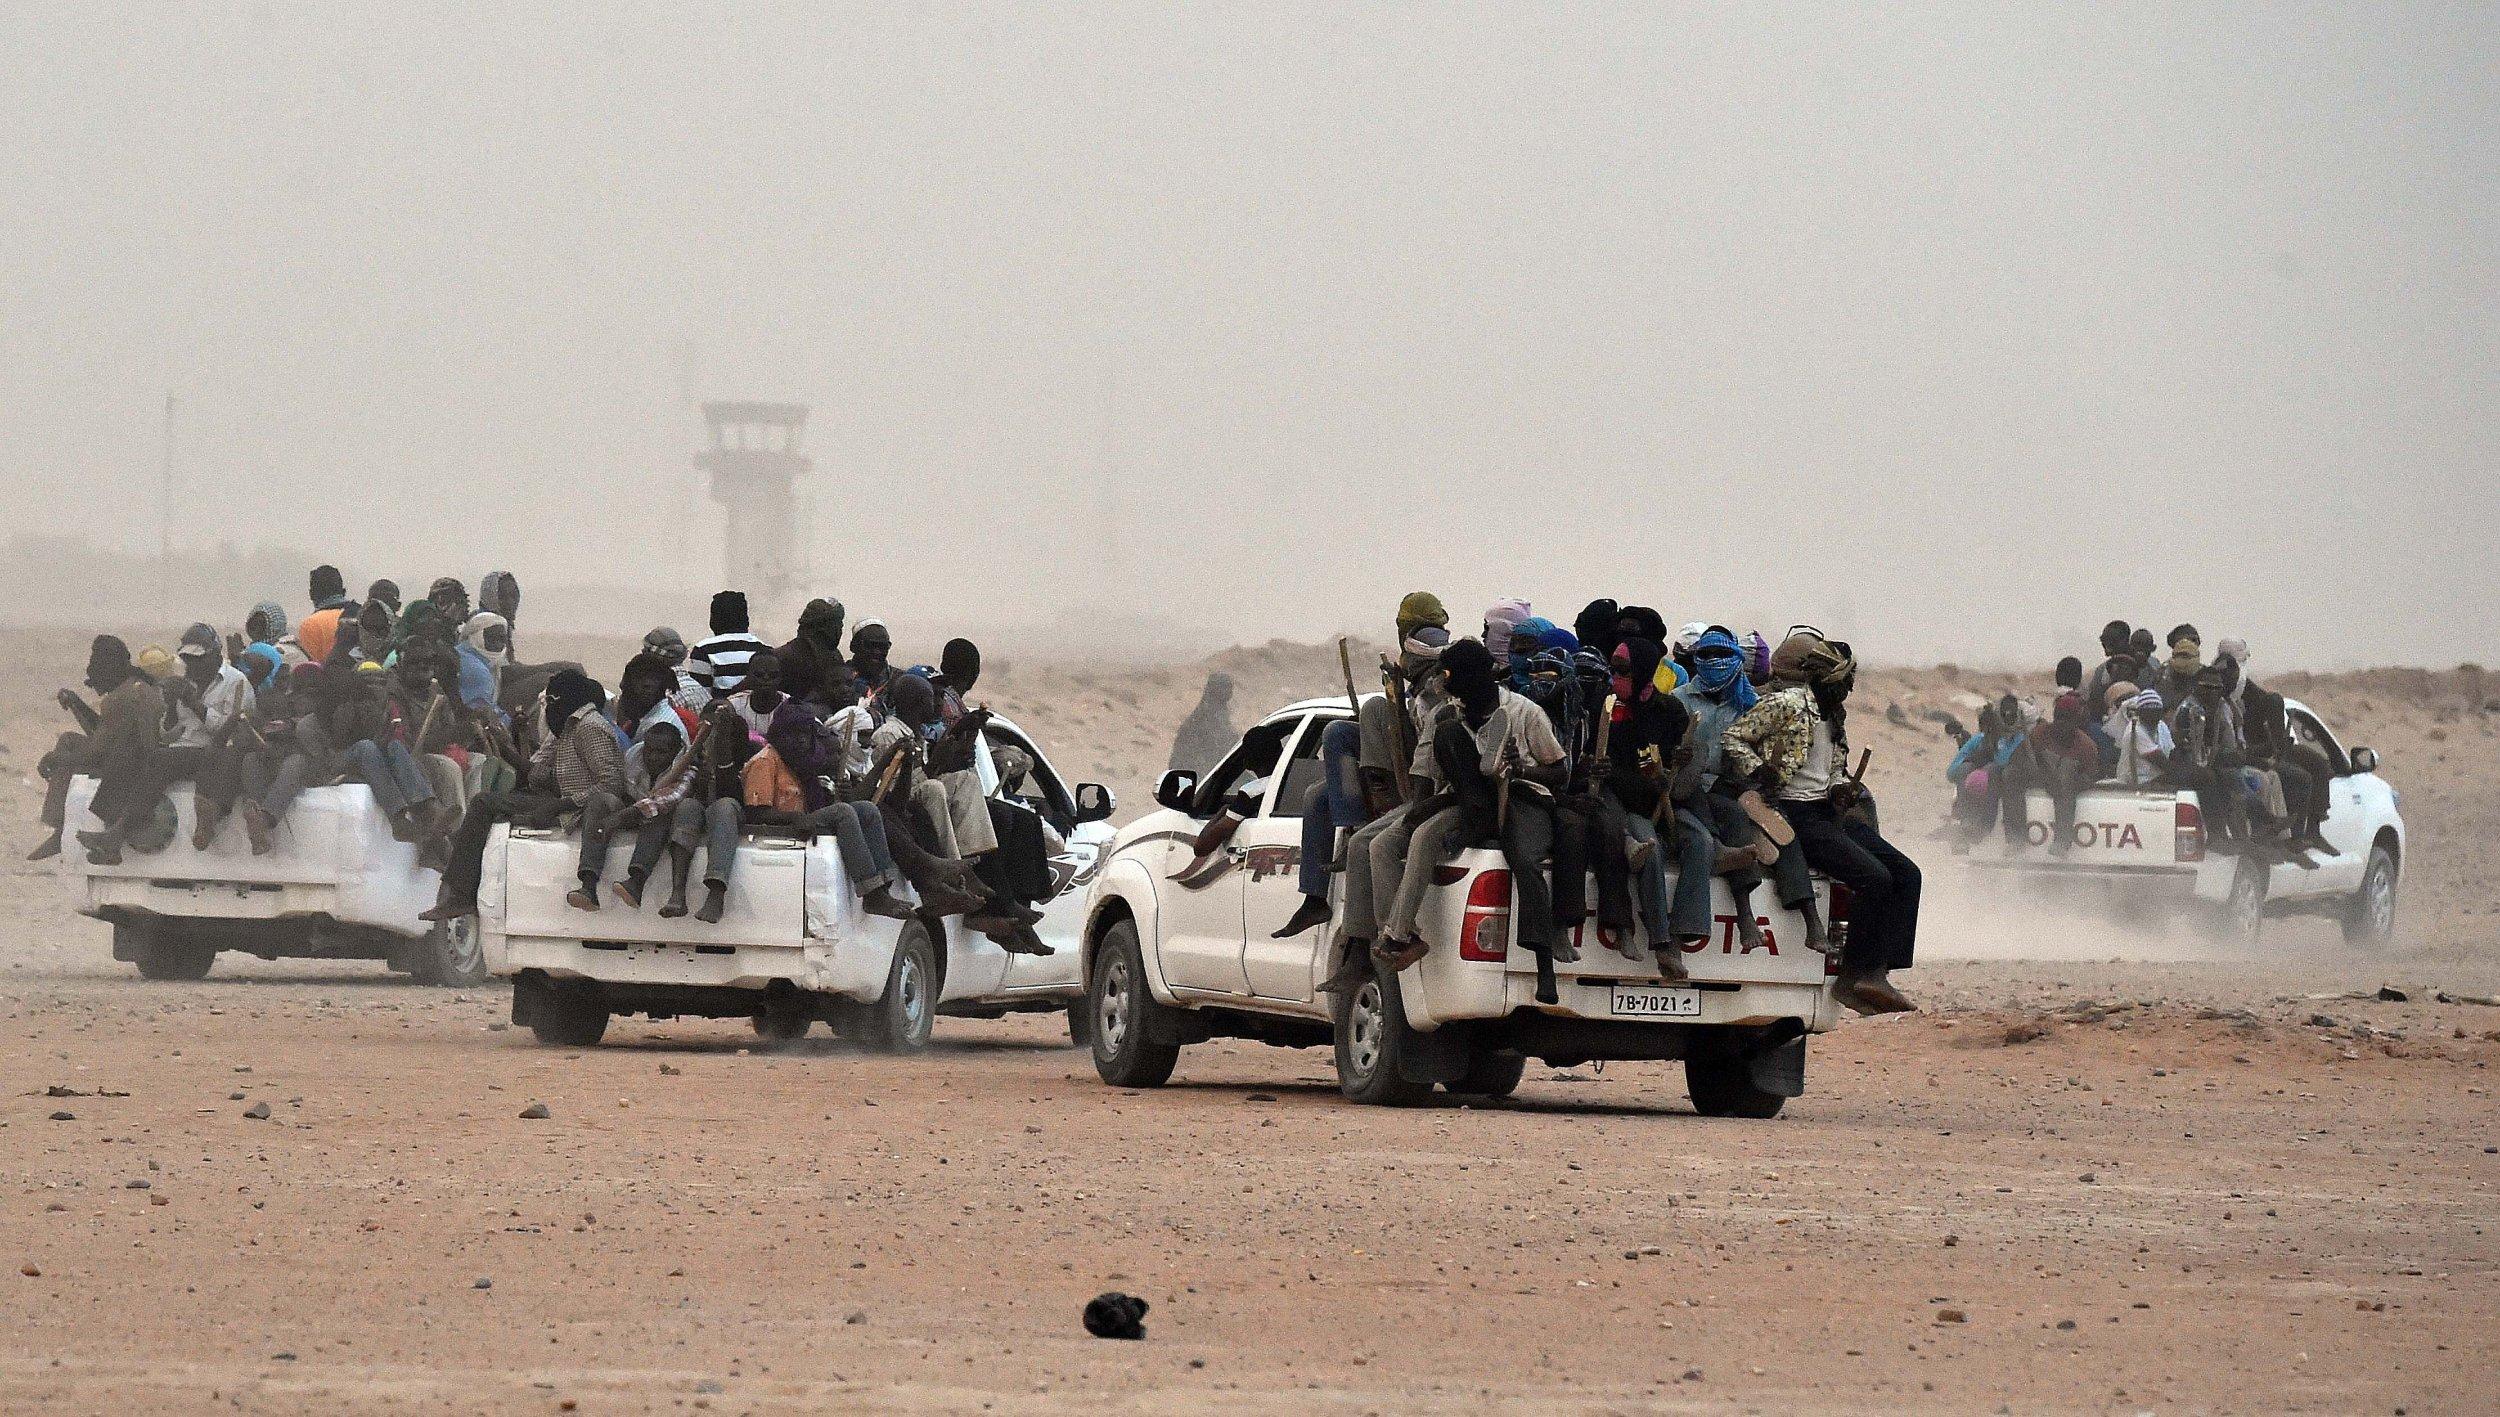 Agadez migrants en route to Libya